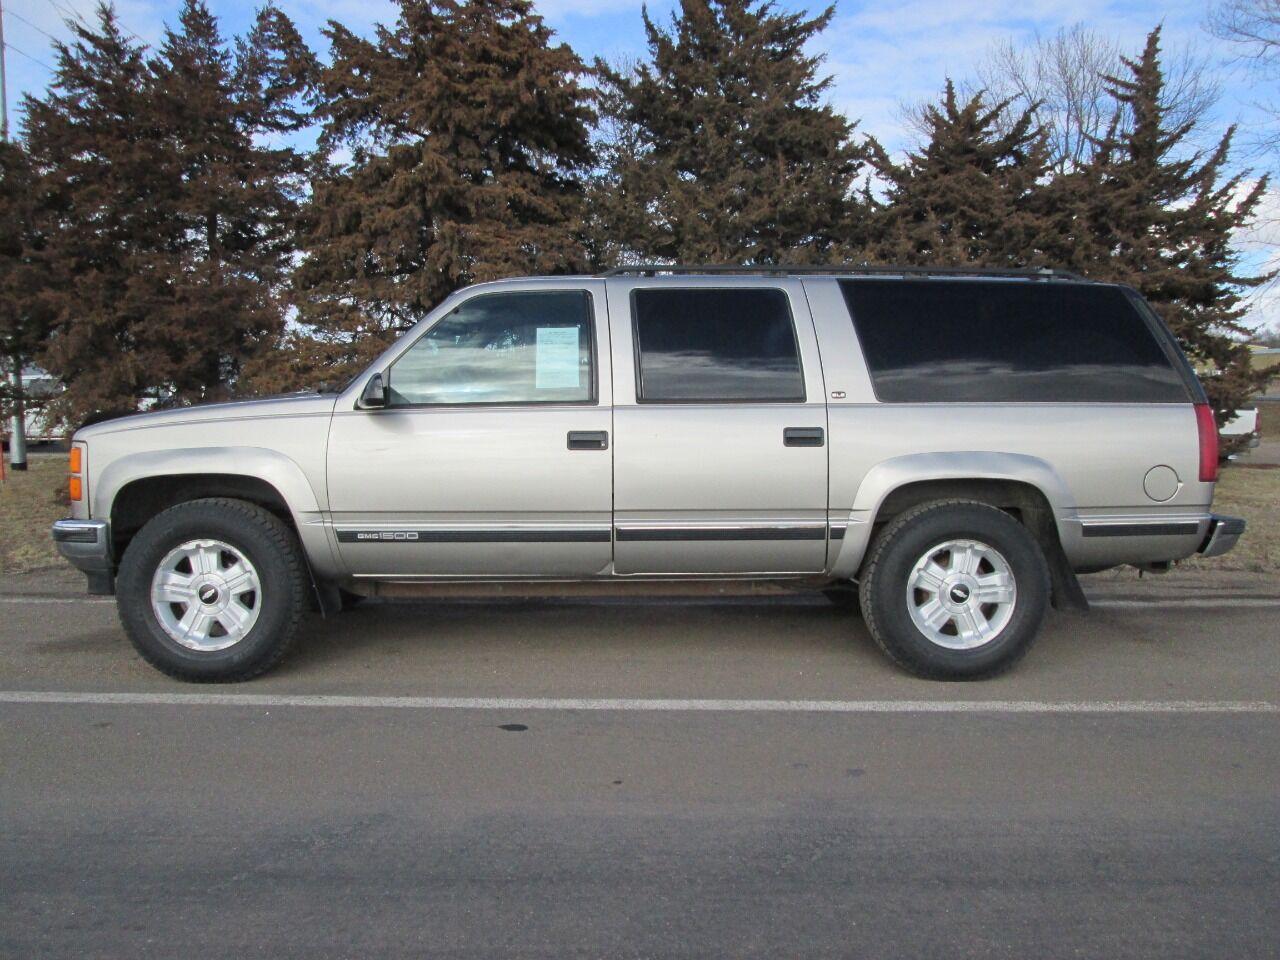 Used Gmc Suburban For Sale Carsforsale Com